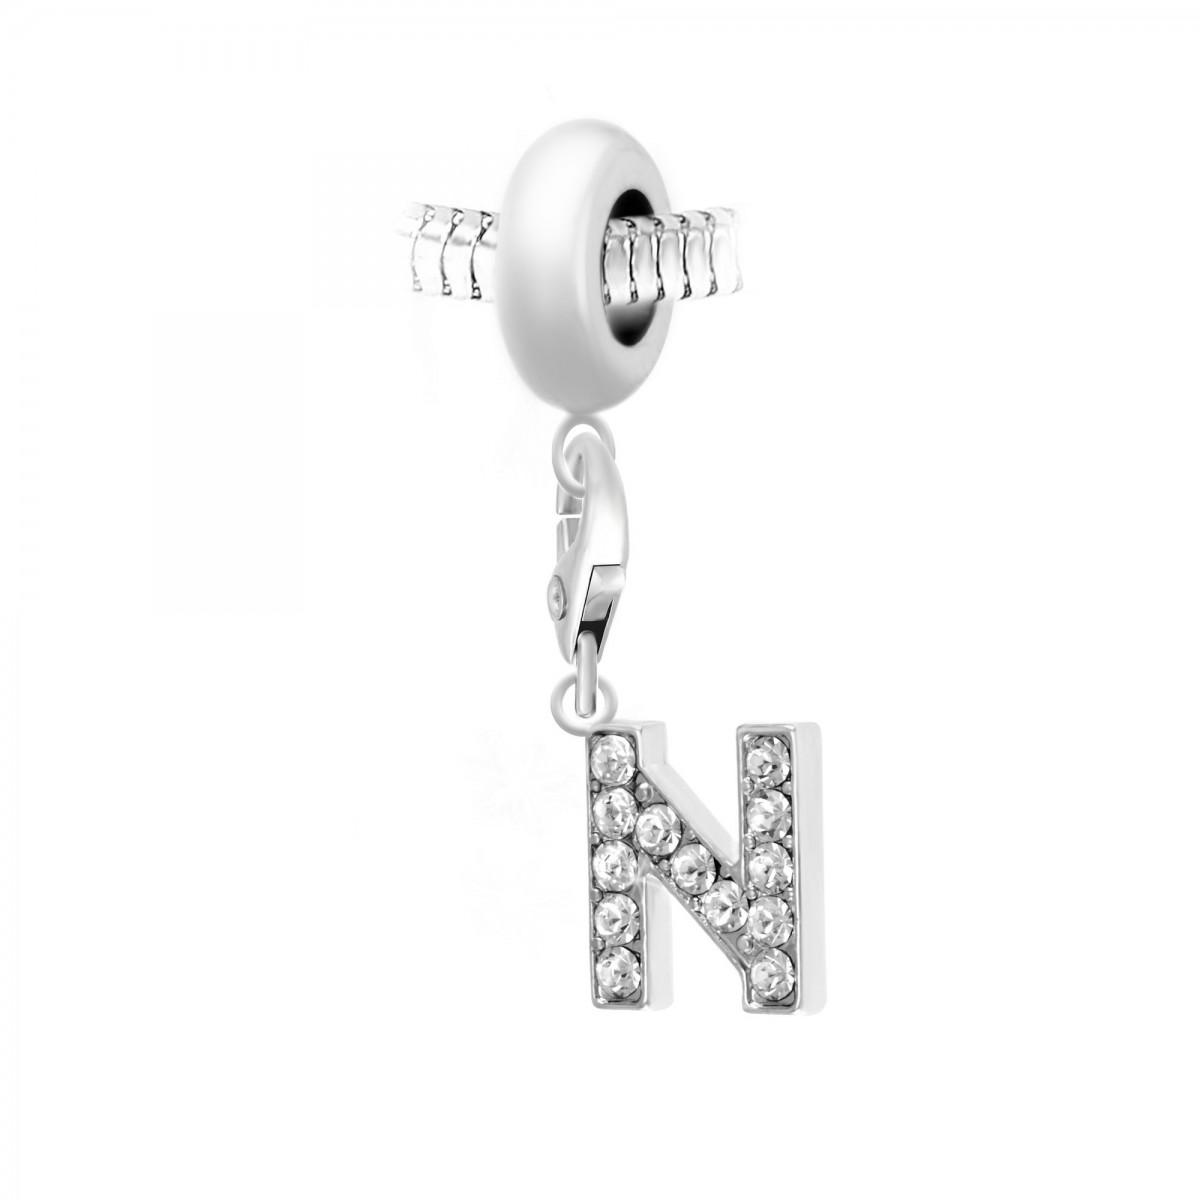 Charm perle So Charm en acier avec pendentif lettre N made with crystal from Swarovski